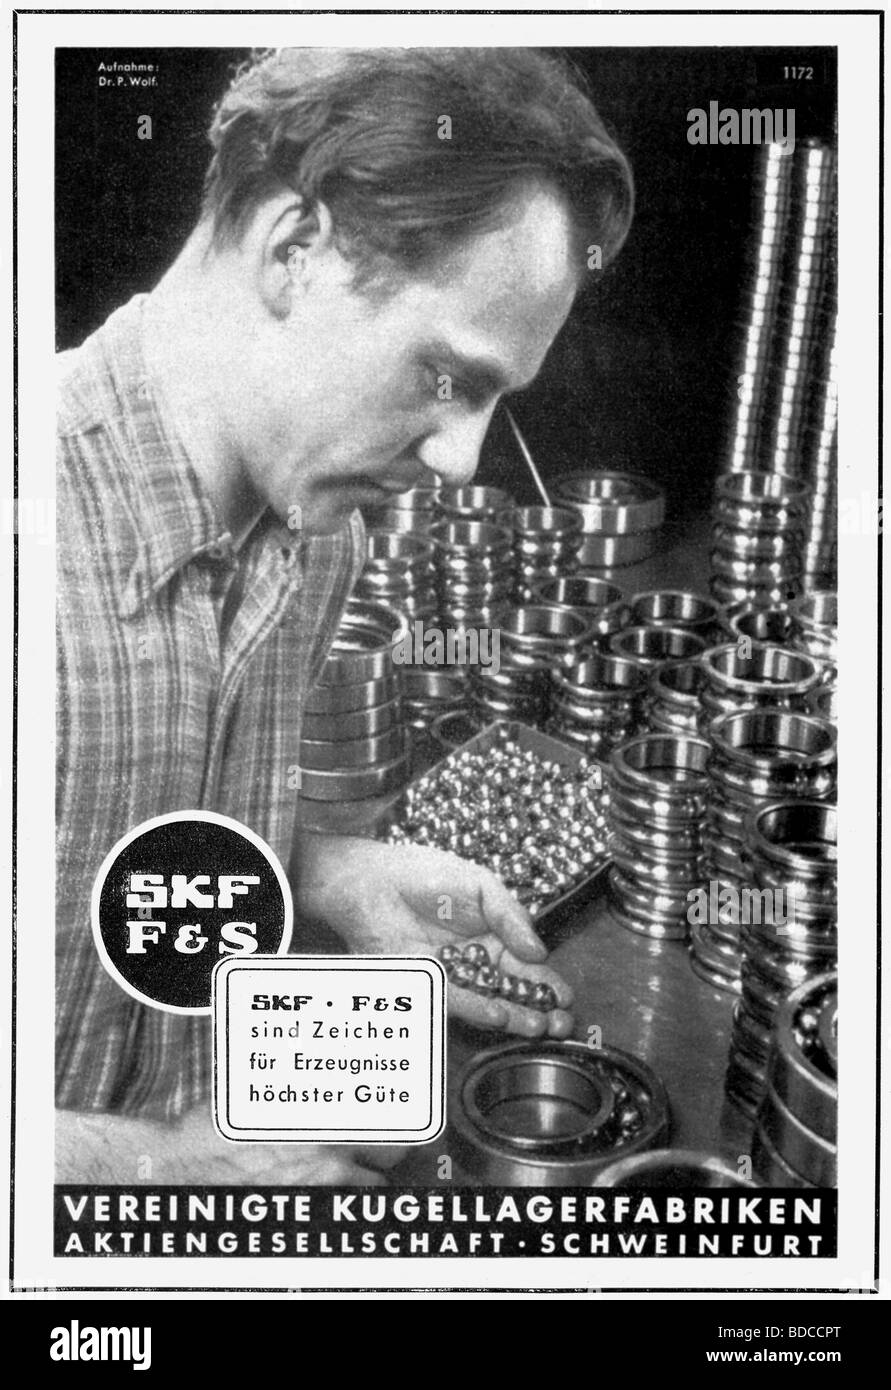 advertising, ball bearing, SKF and F&S, Vereinigte Kugellagerfabriken, Schweinfurt, advert, Germany, 1942, Additional - Stock Image